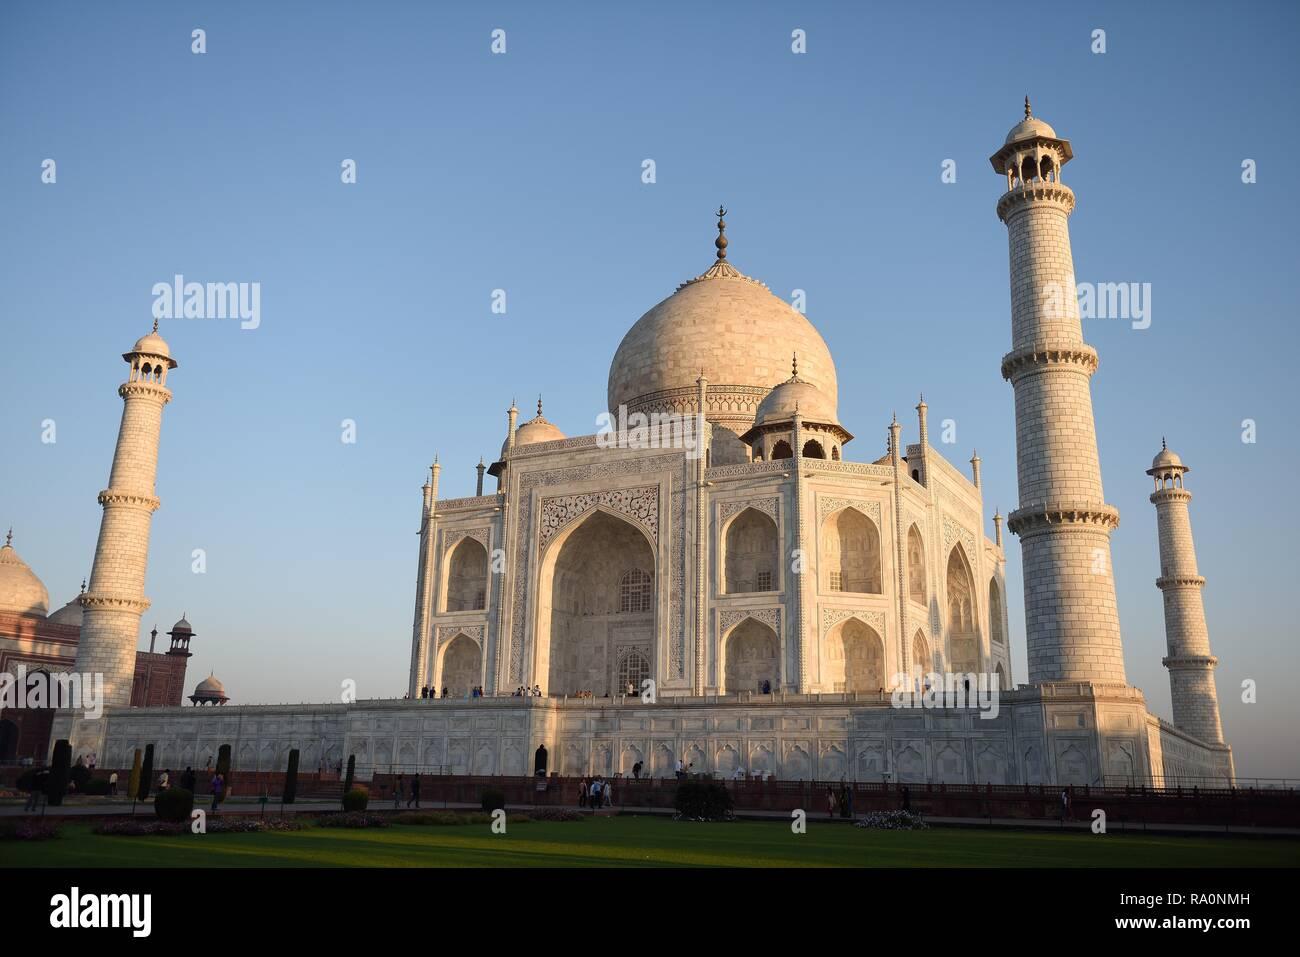 Angled view of the white Makrana marble Taj Mahal at sunrise in Agra, India. - Stock Image